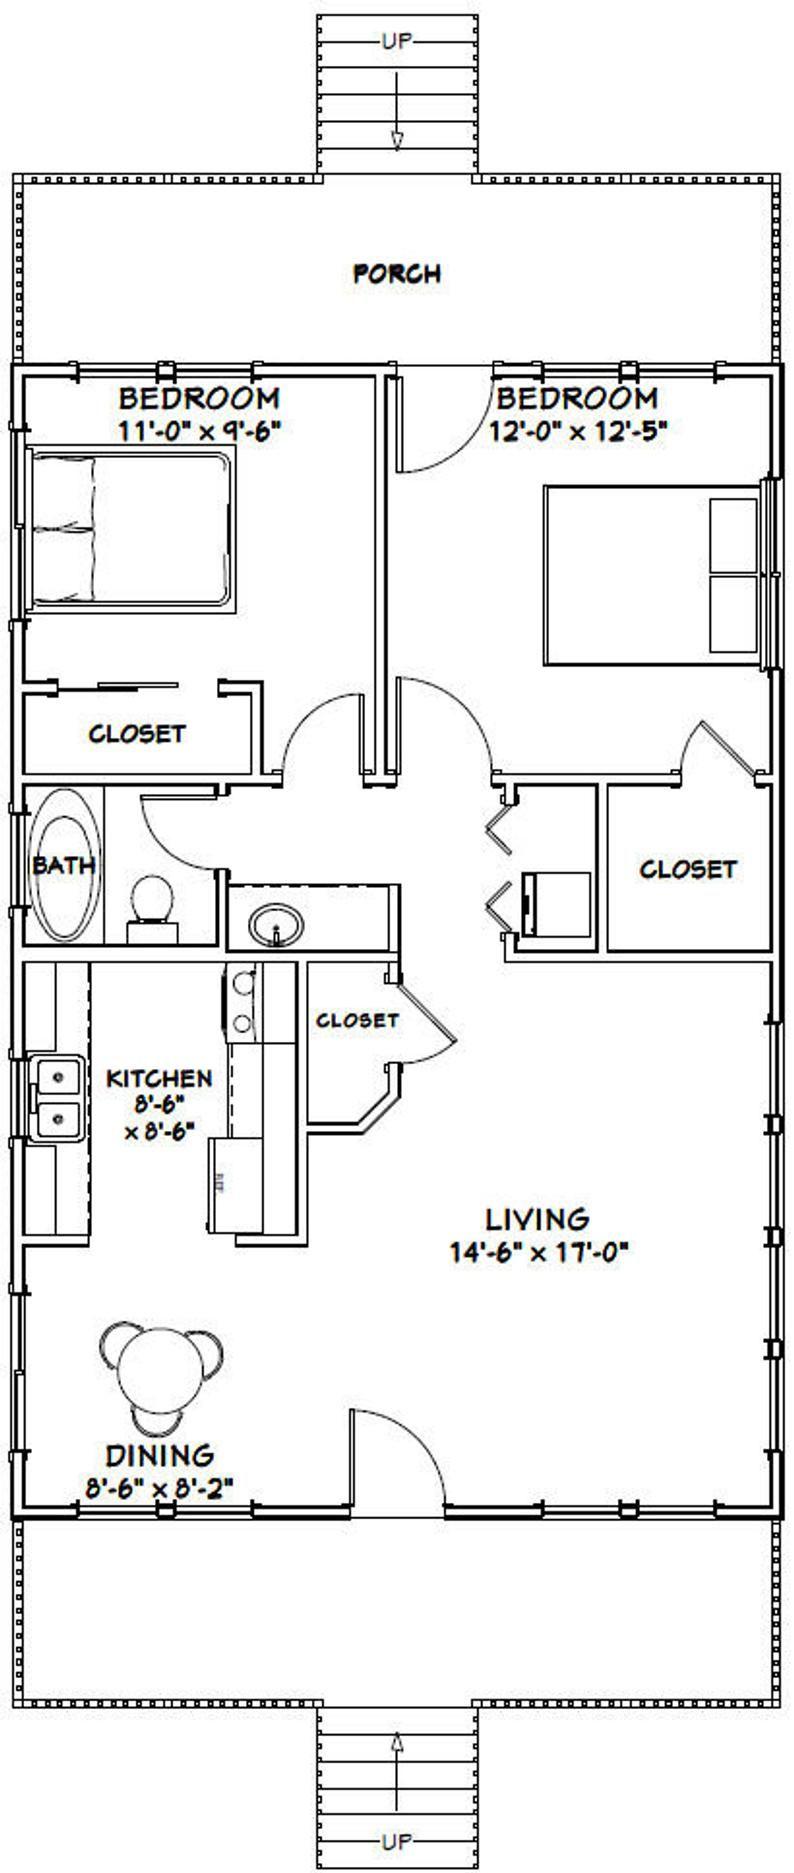 24x36 House 2 Bedroom 1 Bath 864 Sq Ft Pdf Floor Plan Etsy In 2020 Single Story House Floor Plans House Plans Floor Plans